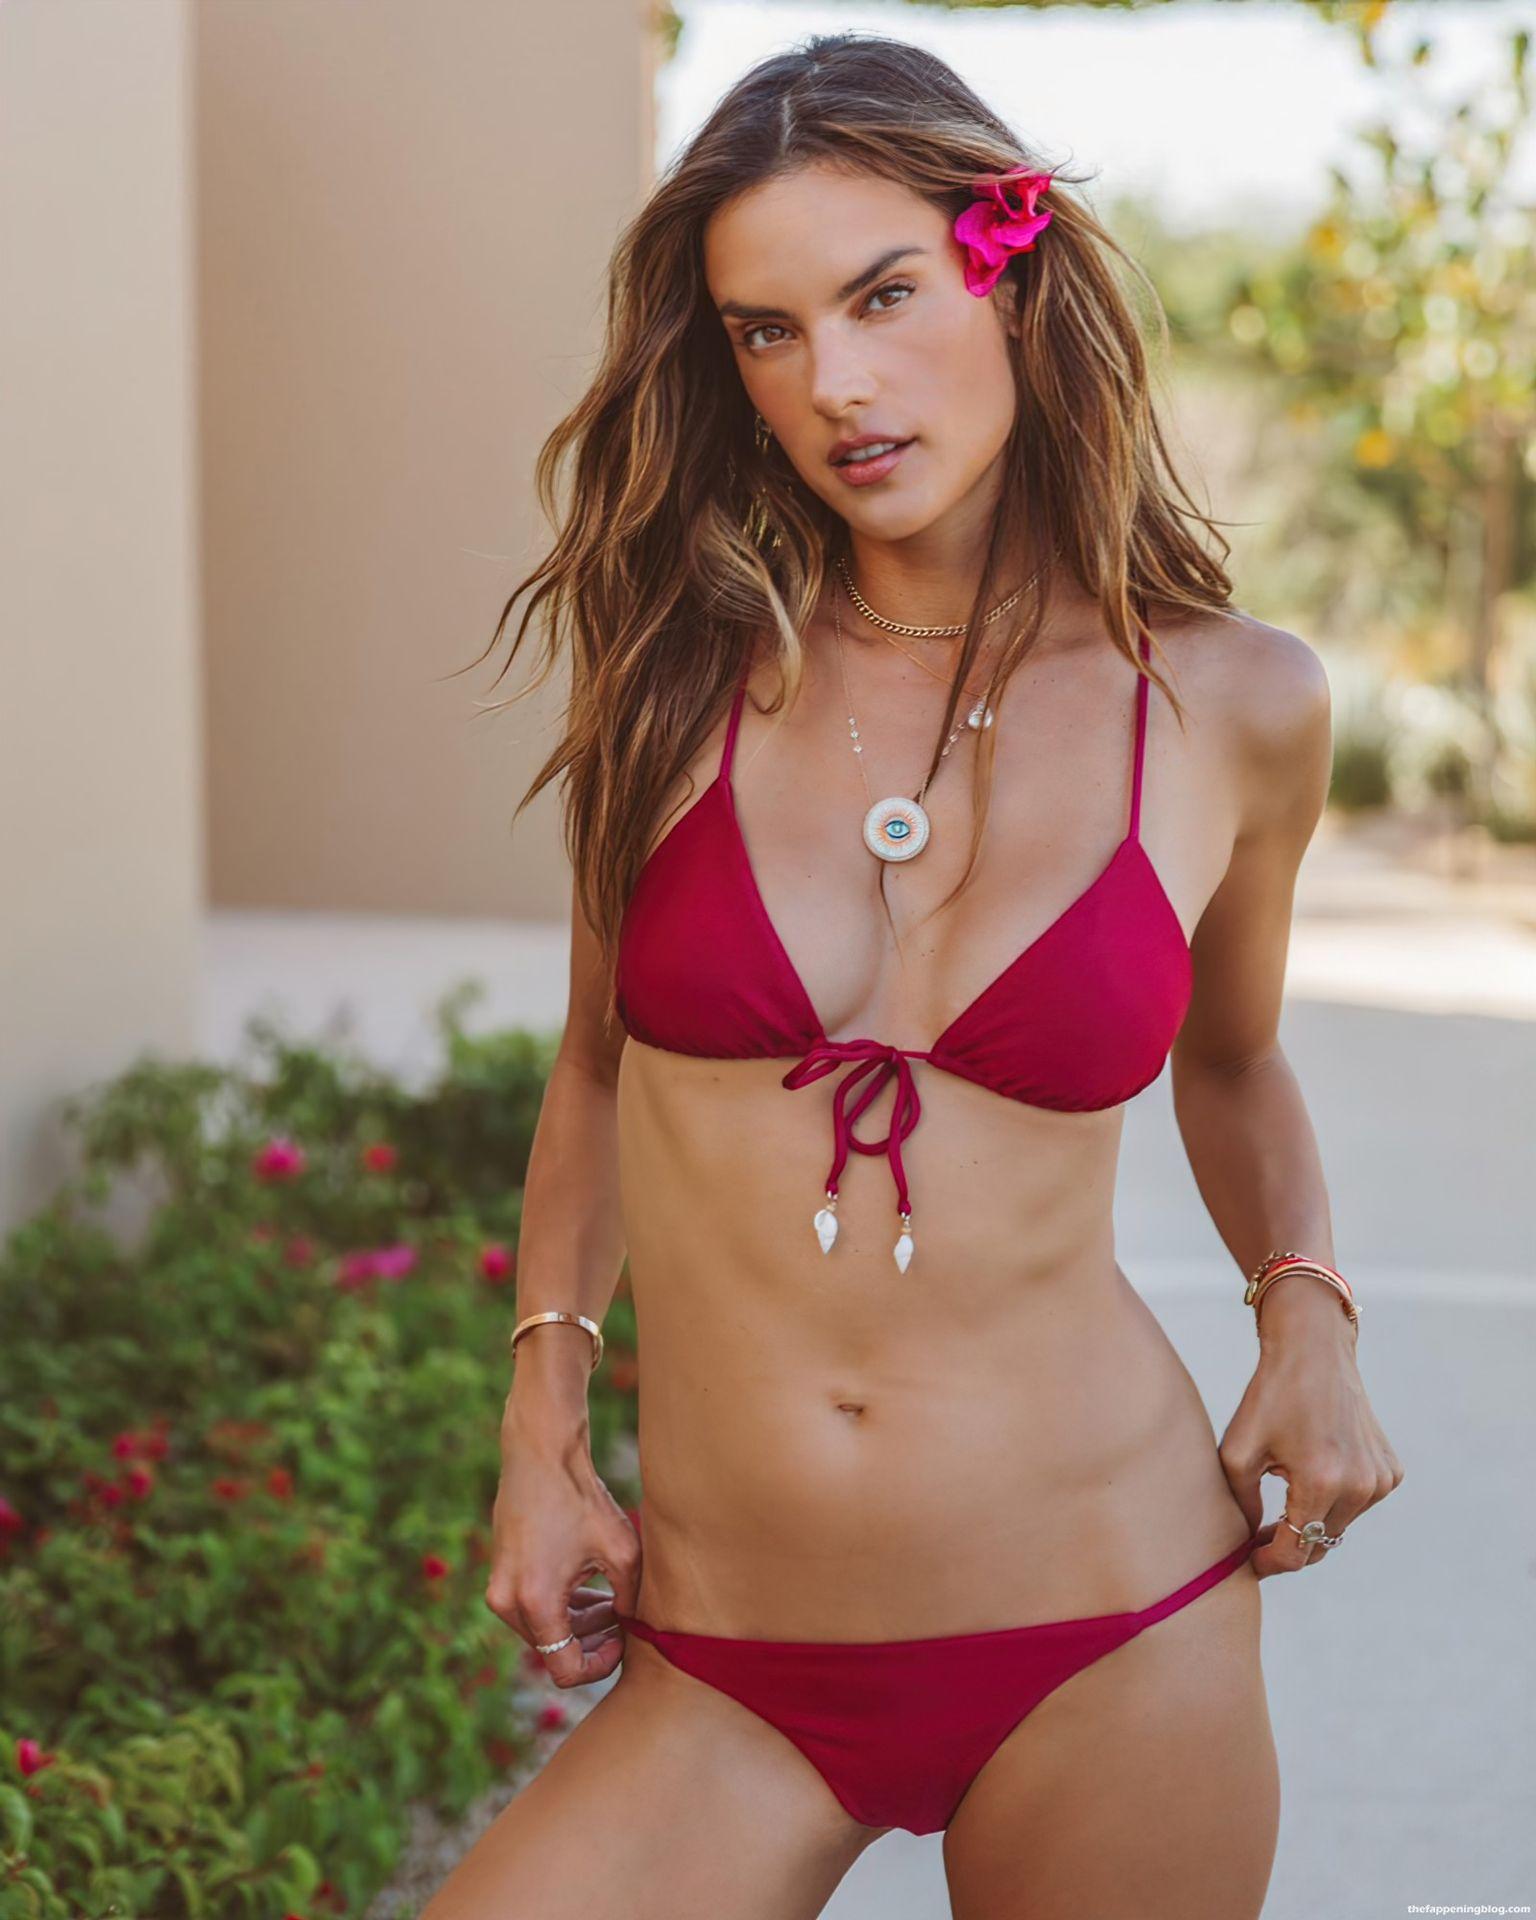 Alessandra-Ambrosio-Sexy-Bikinis-9-thefappeningblog.com_.jpg